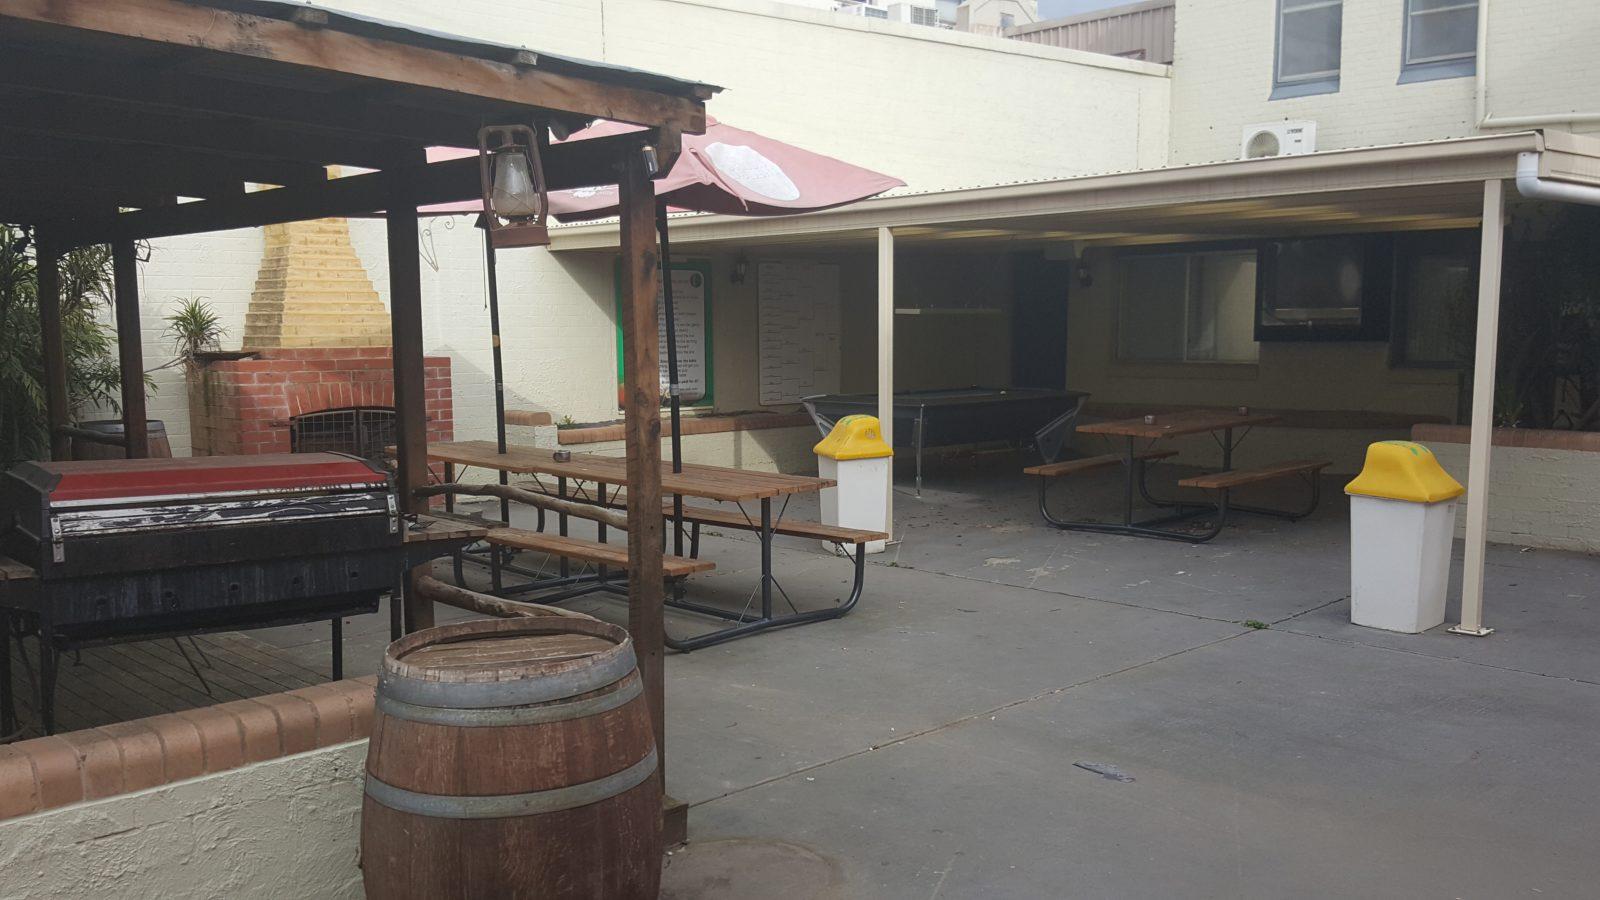 Great Eastern Hotel Motel Young Hilltops Region NSW 2594